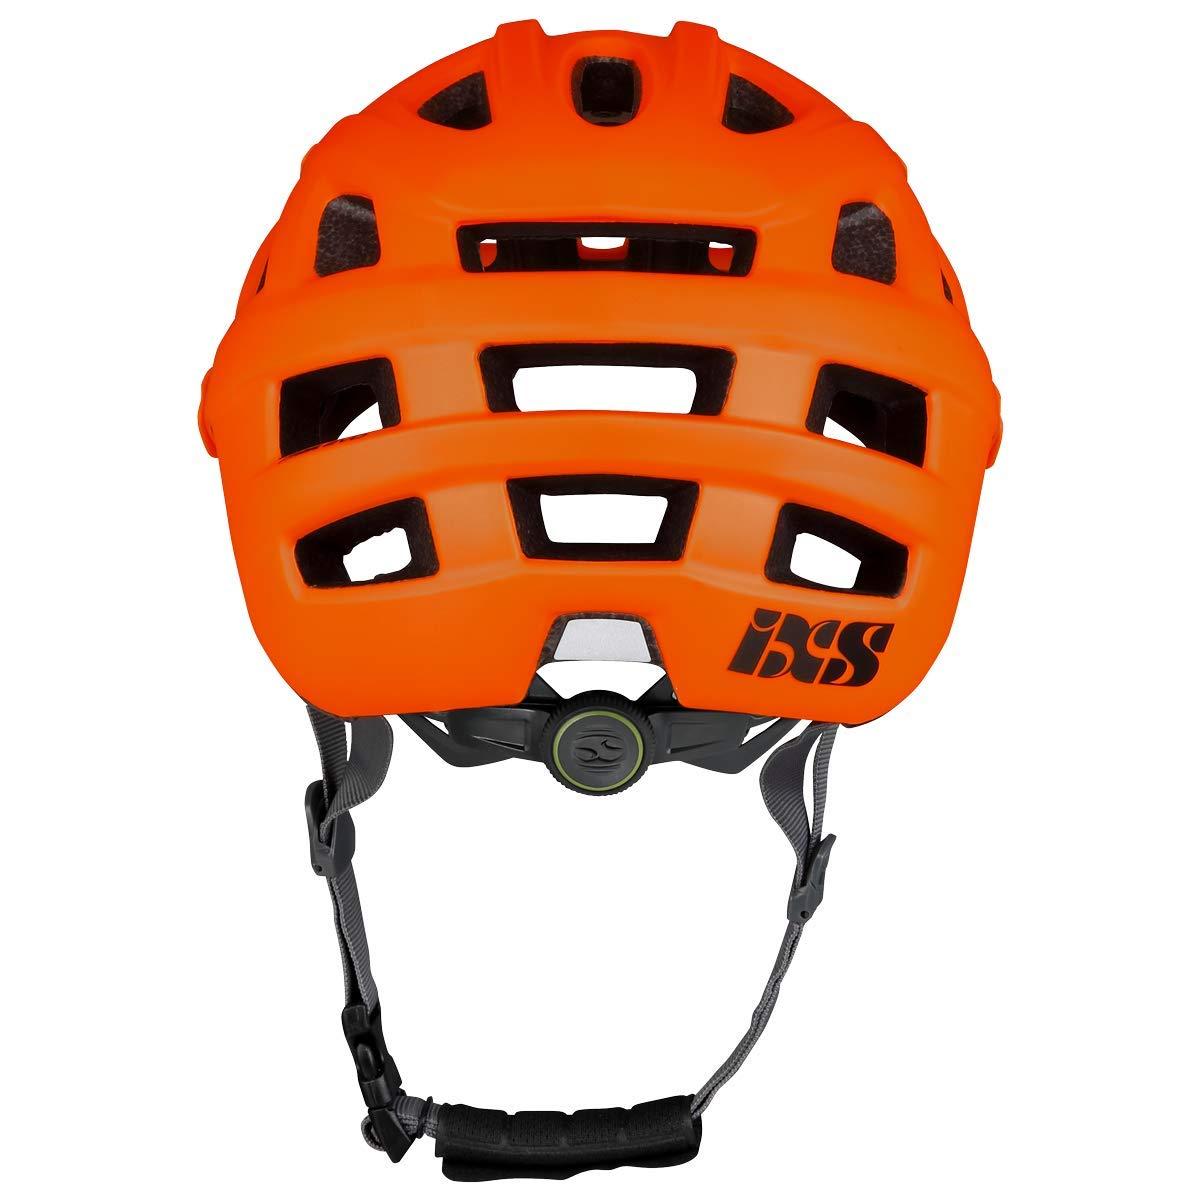 IXS RS Evo Casco MTB Trail//All Mountain Adulto Unisex SM Arancione 54-58 cm